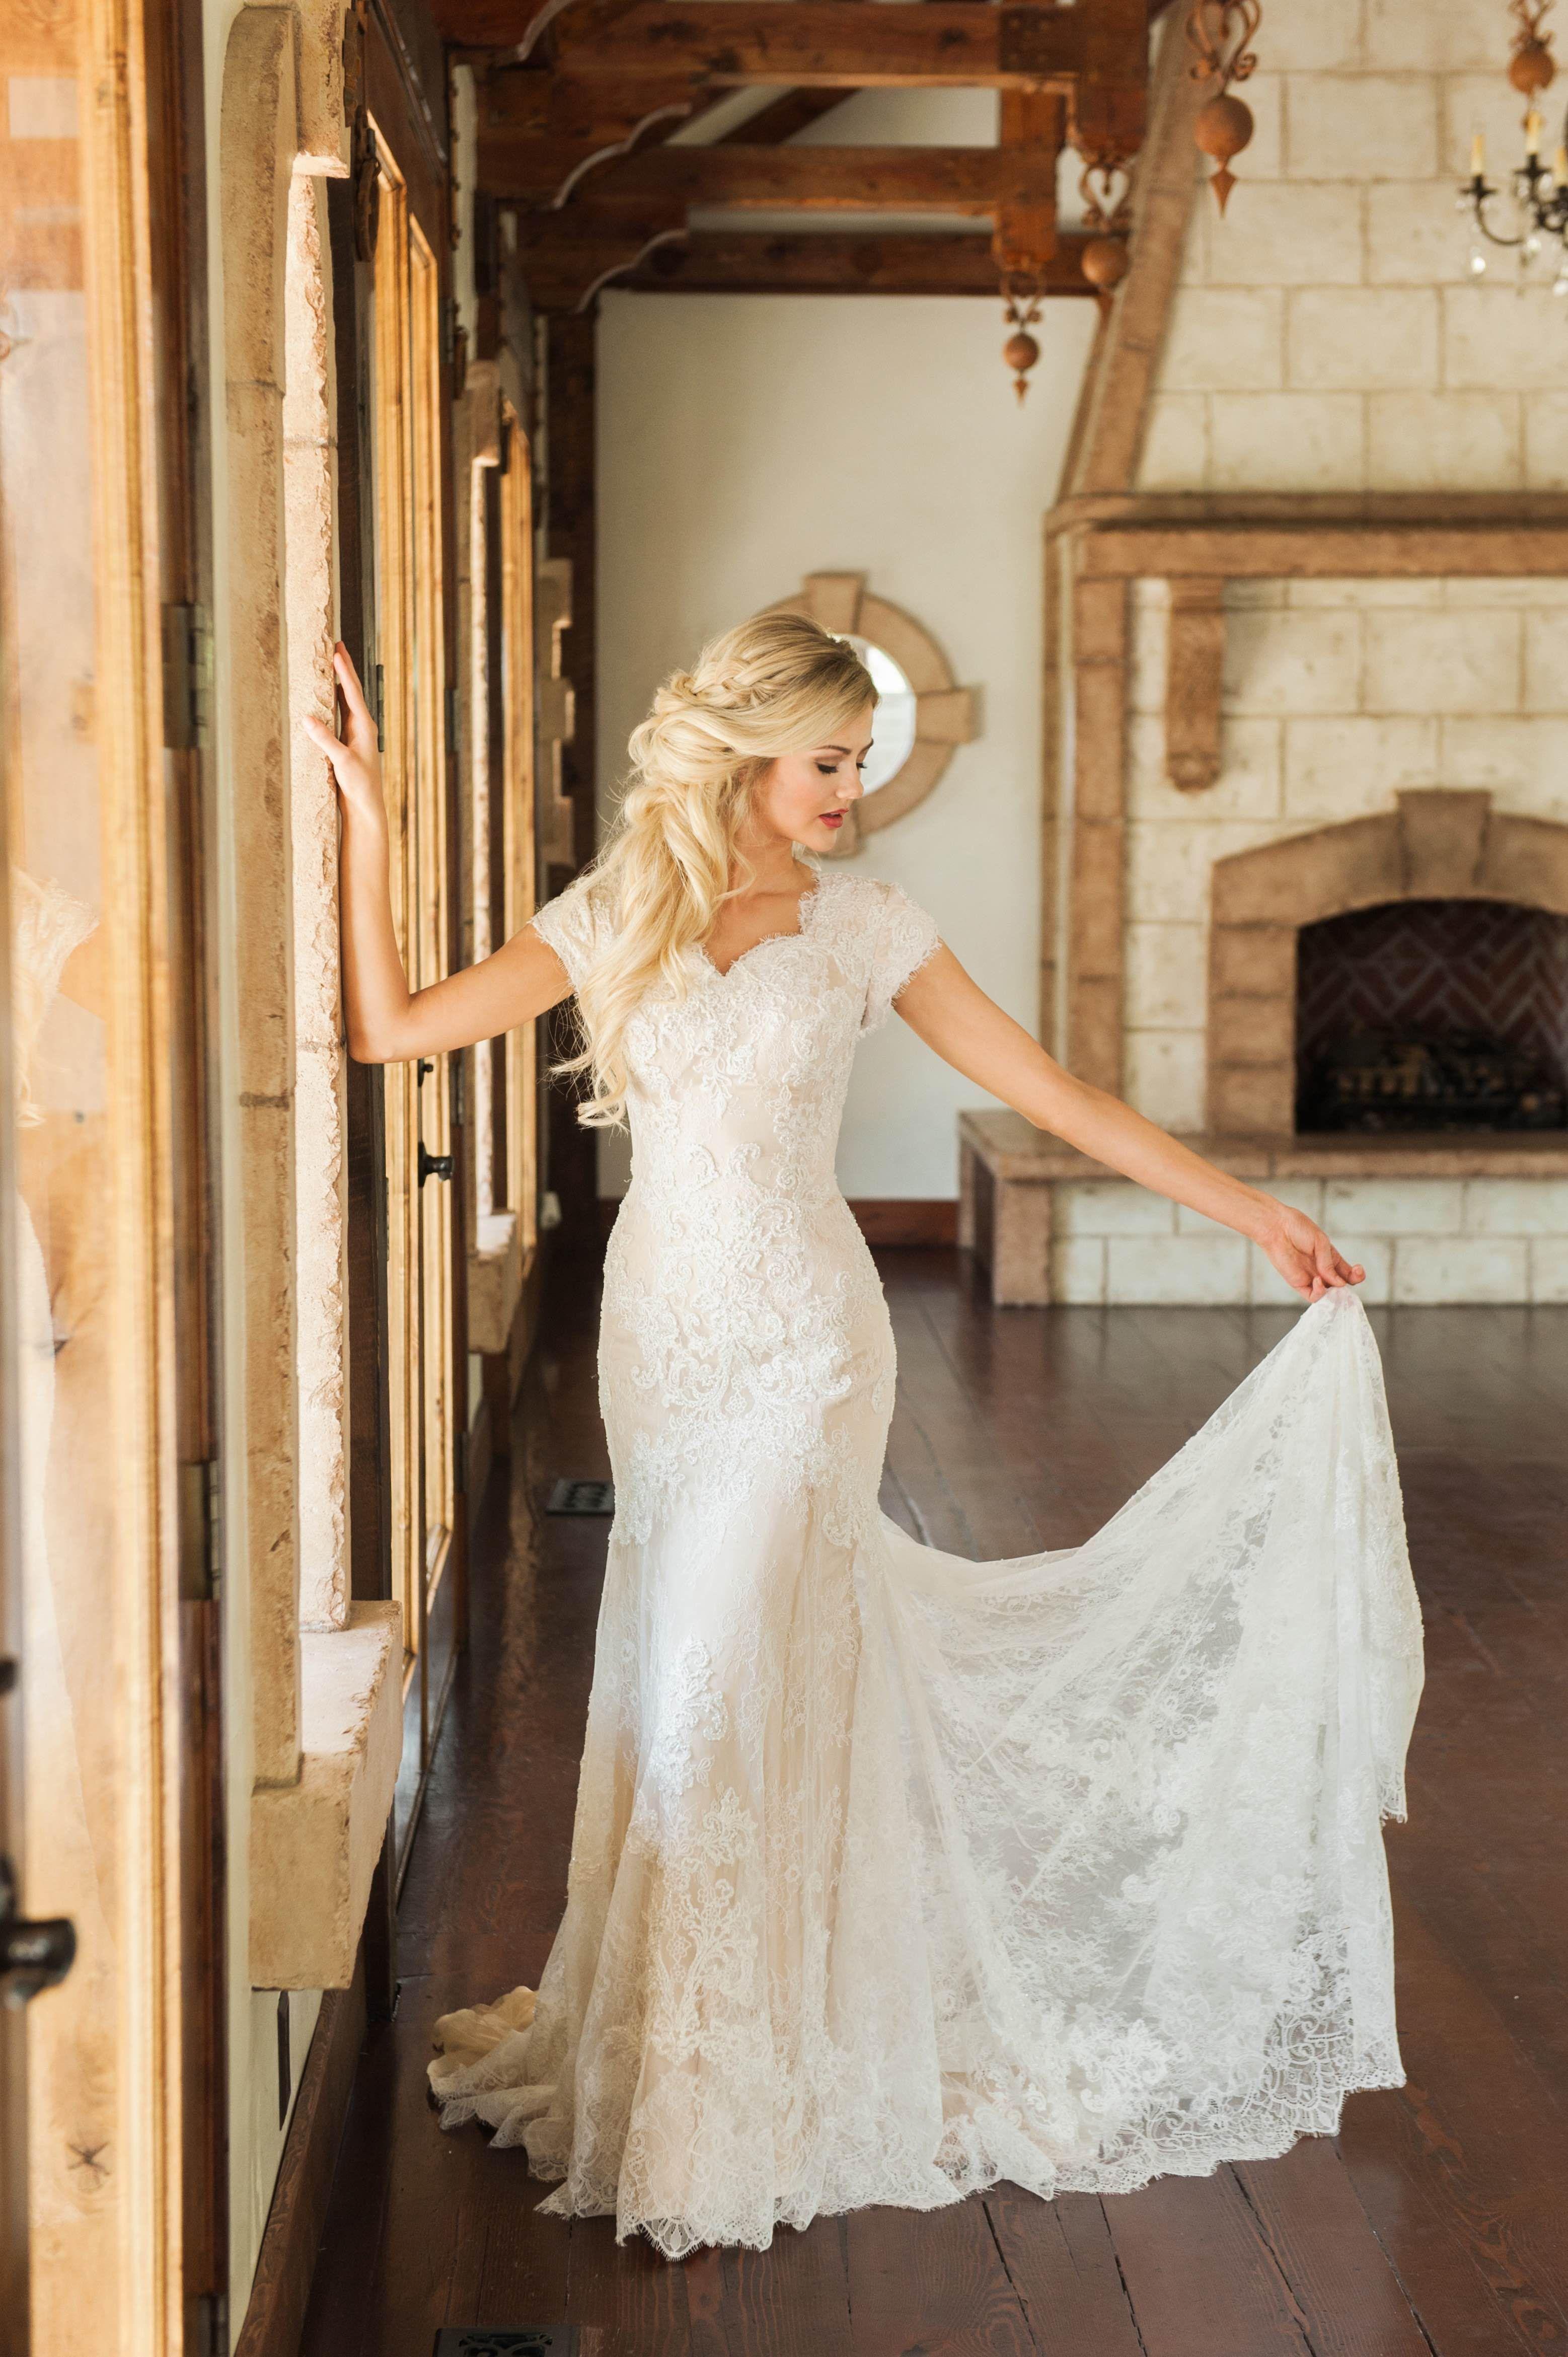 30 Gorgeous Modest Wedding Dresses  Latterday Saint Wedding Ideas  Pinterest  Brautkleid